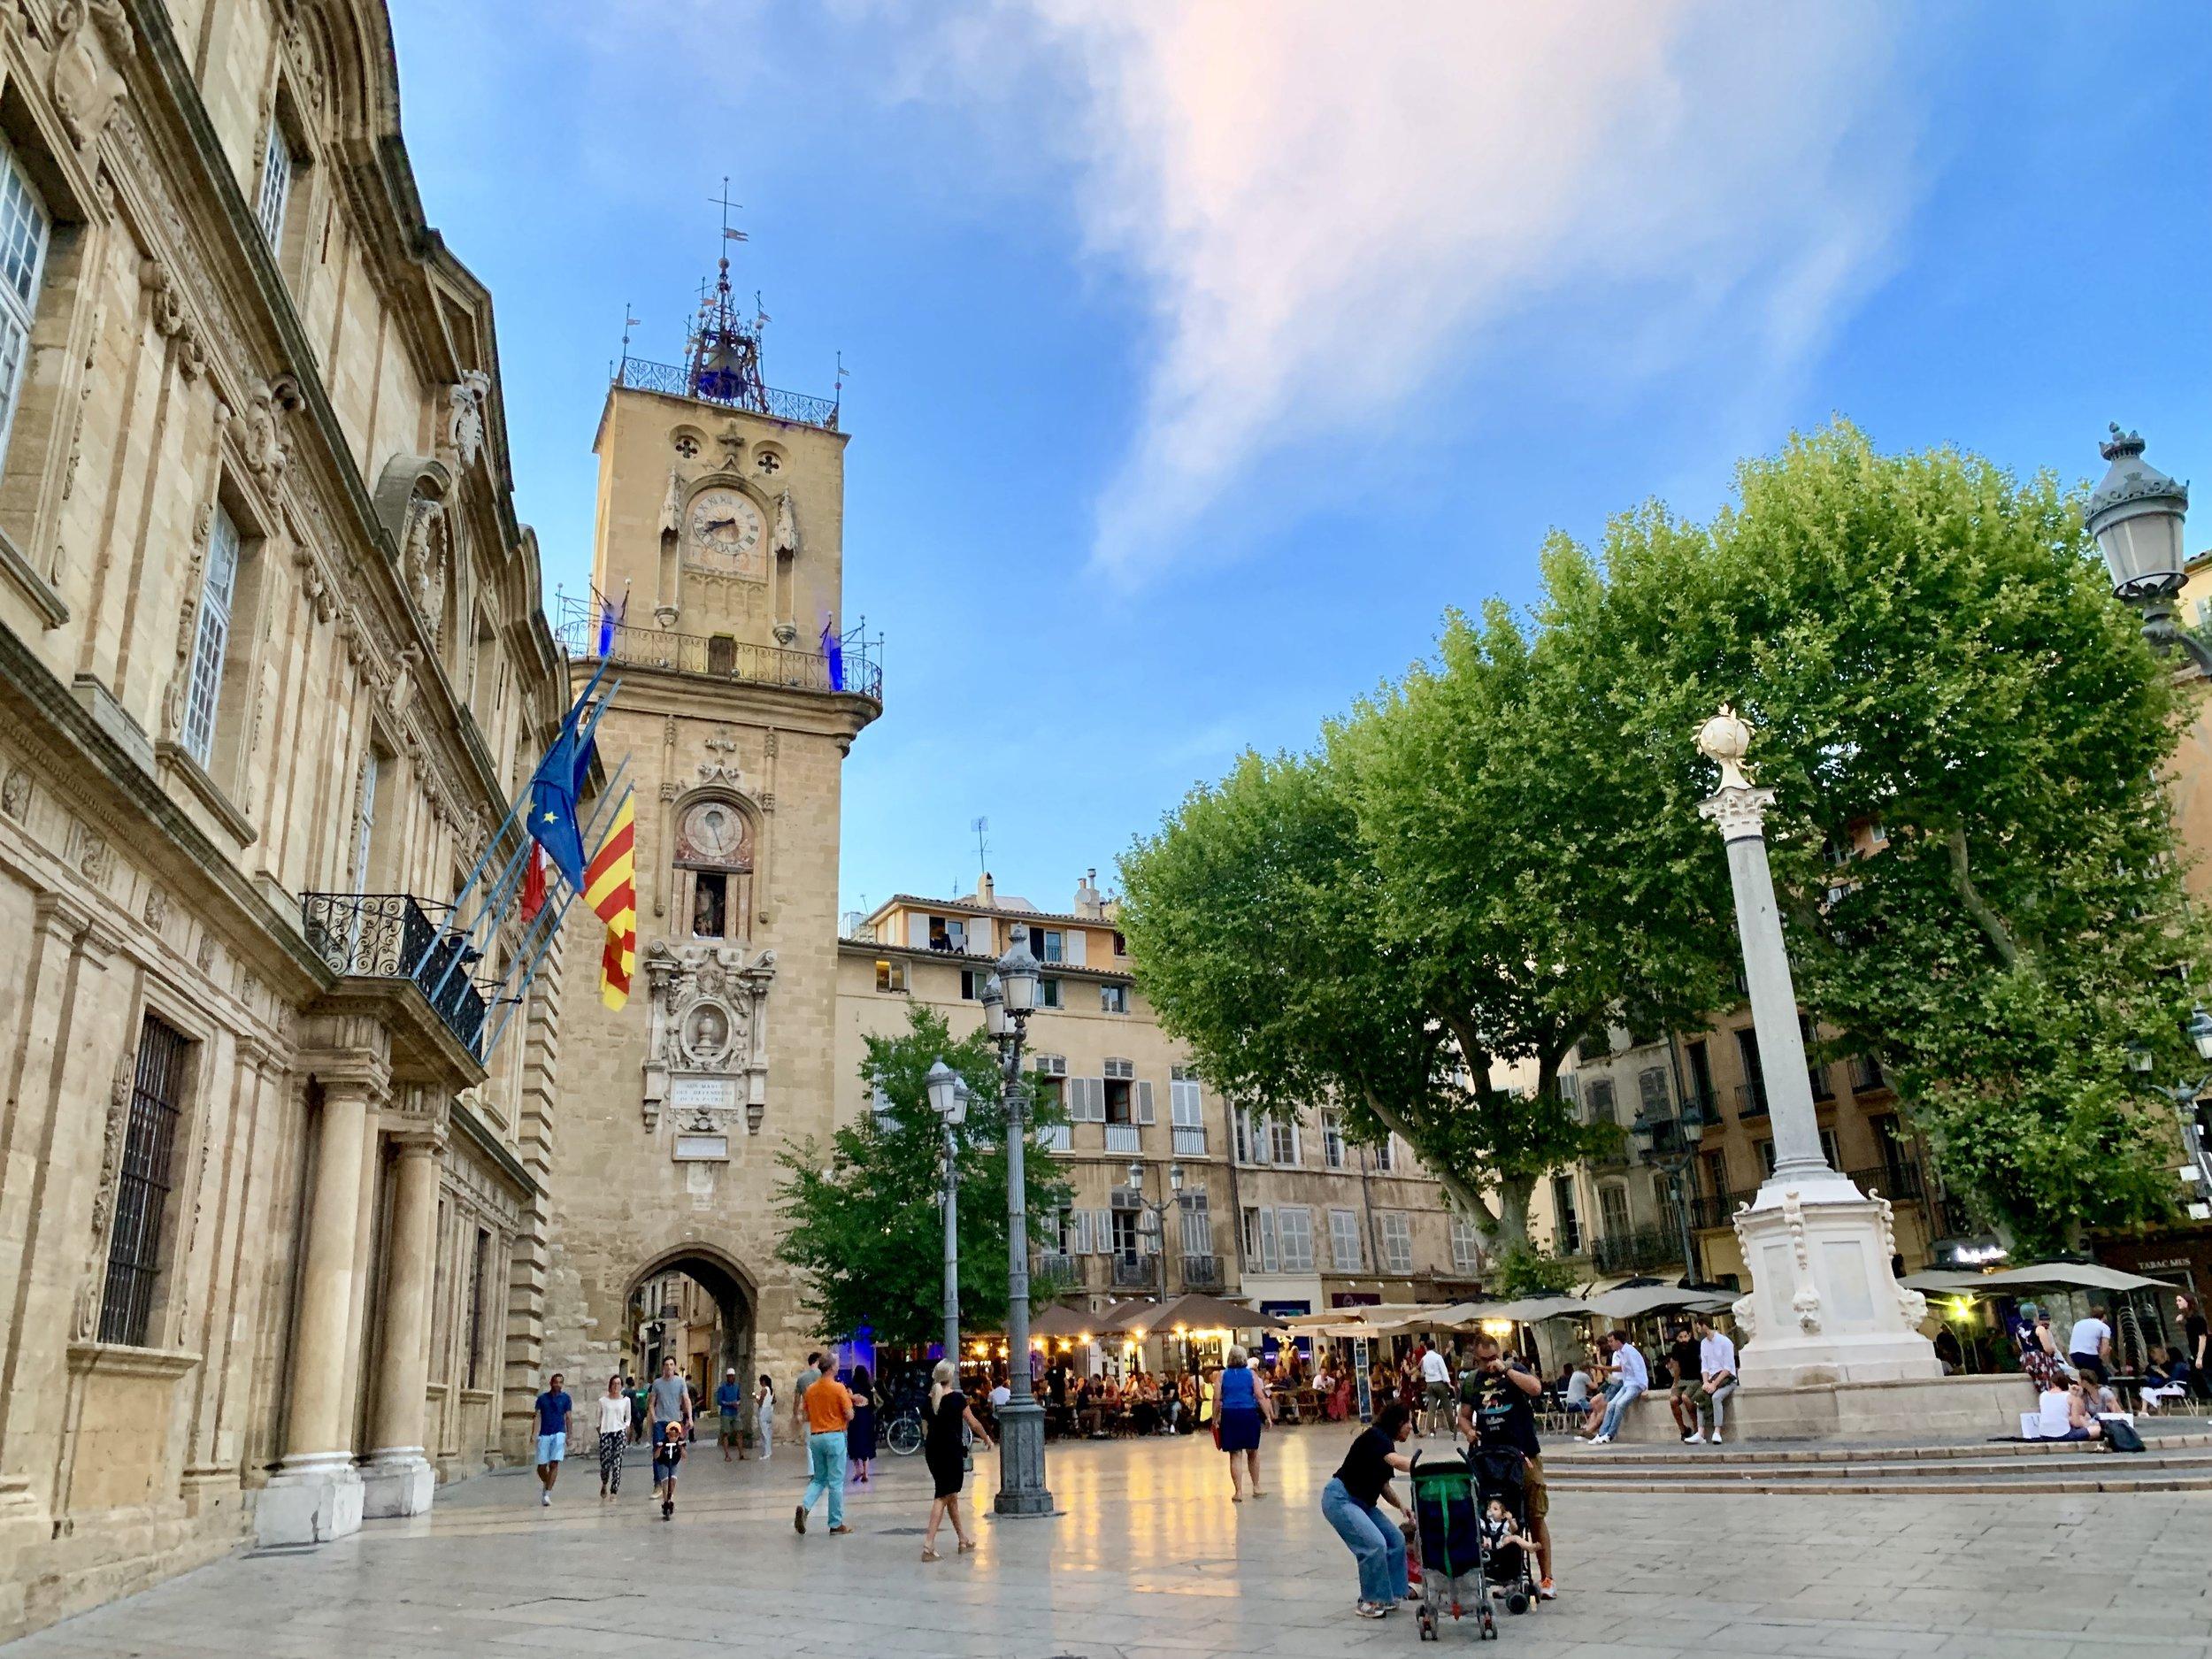 Aix-en-Provence-Old-Town-3.jpg